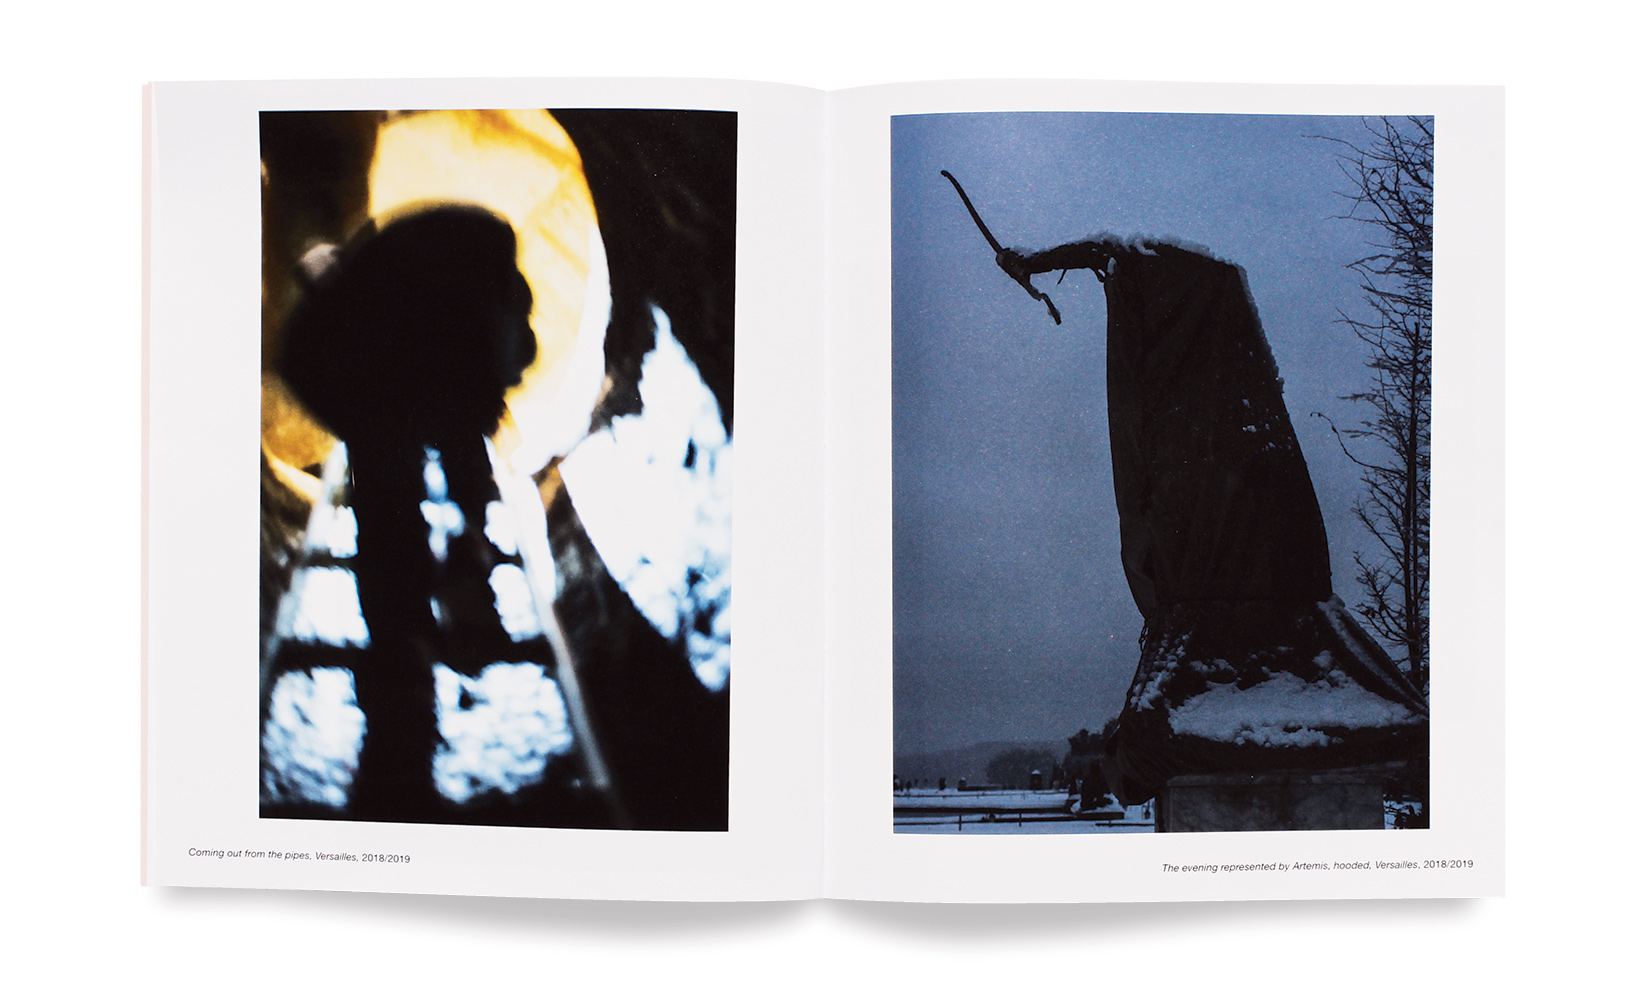 versailles-visible-invisible-toluca-studio-olivier-andreotti-NAN-GOLDIN-5.jpg